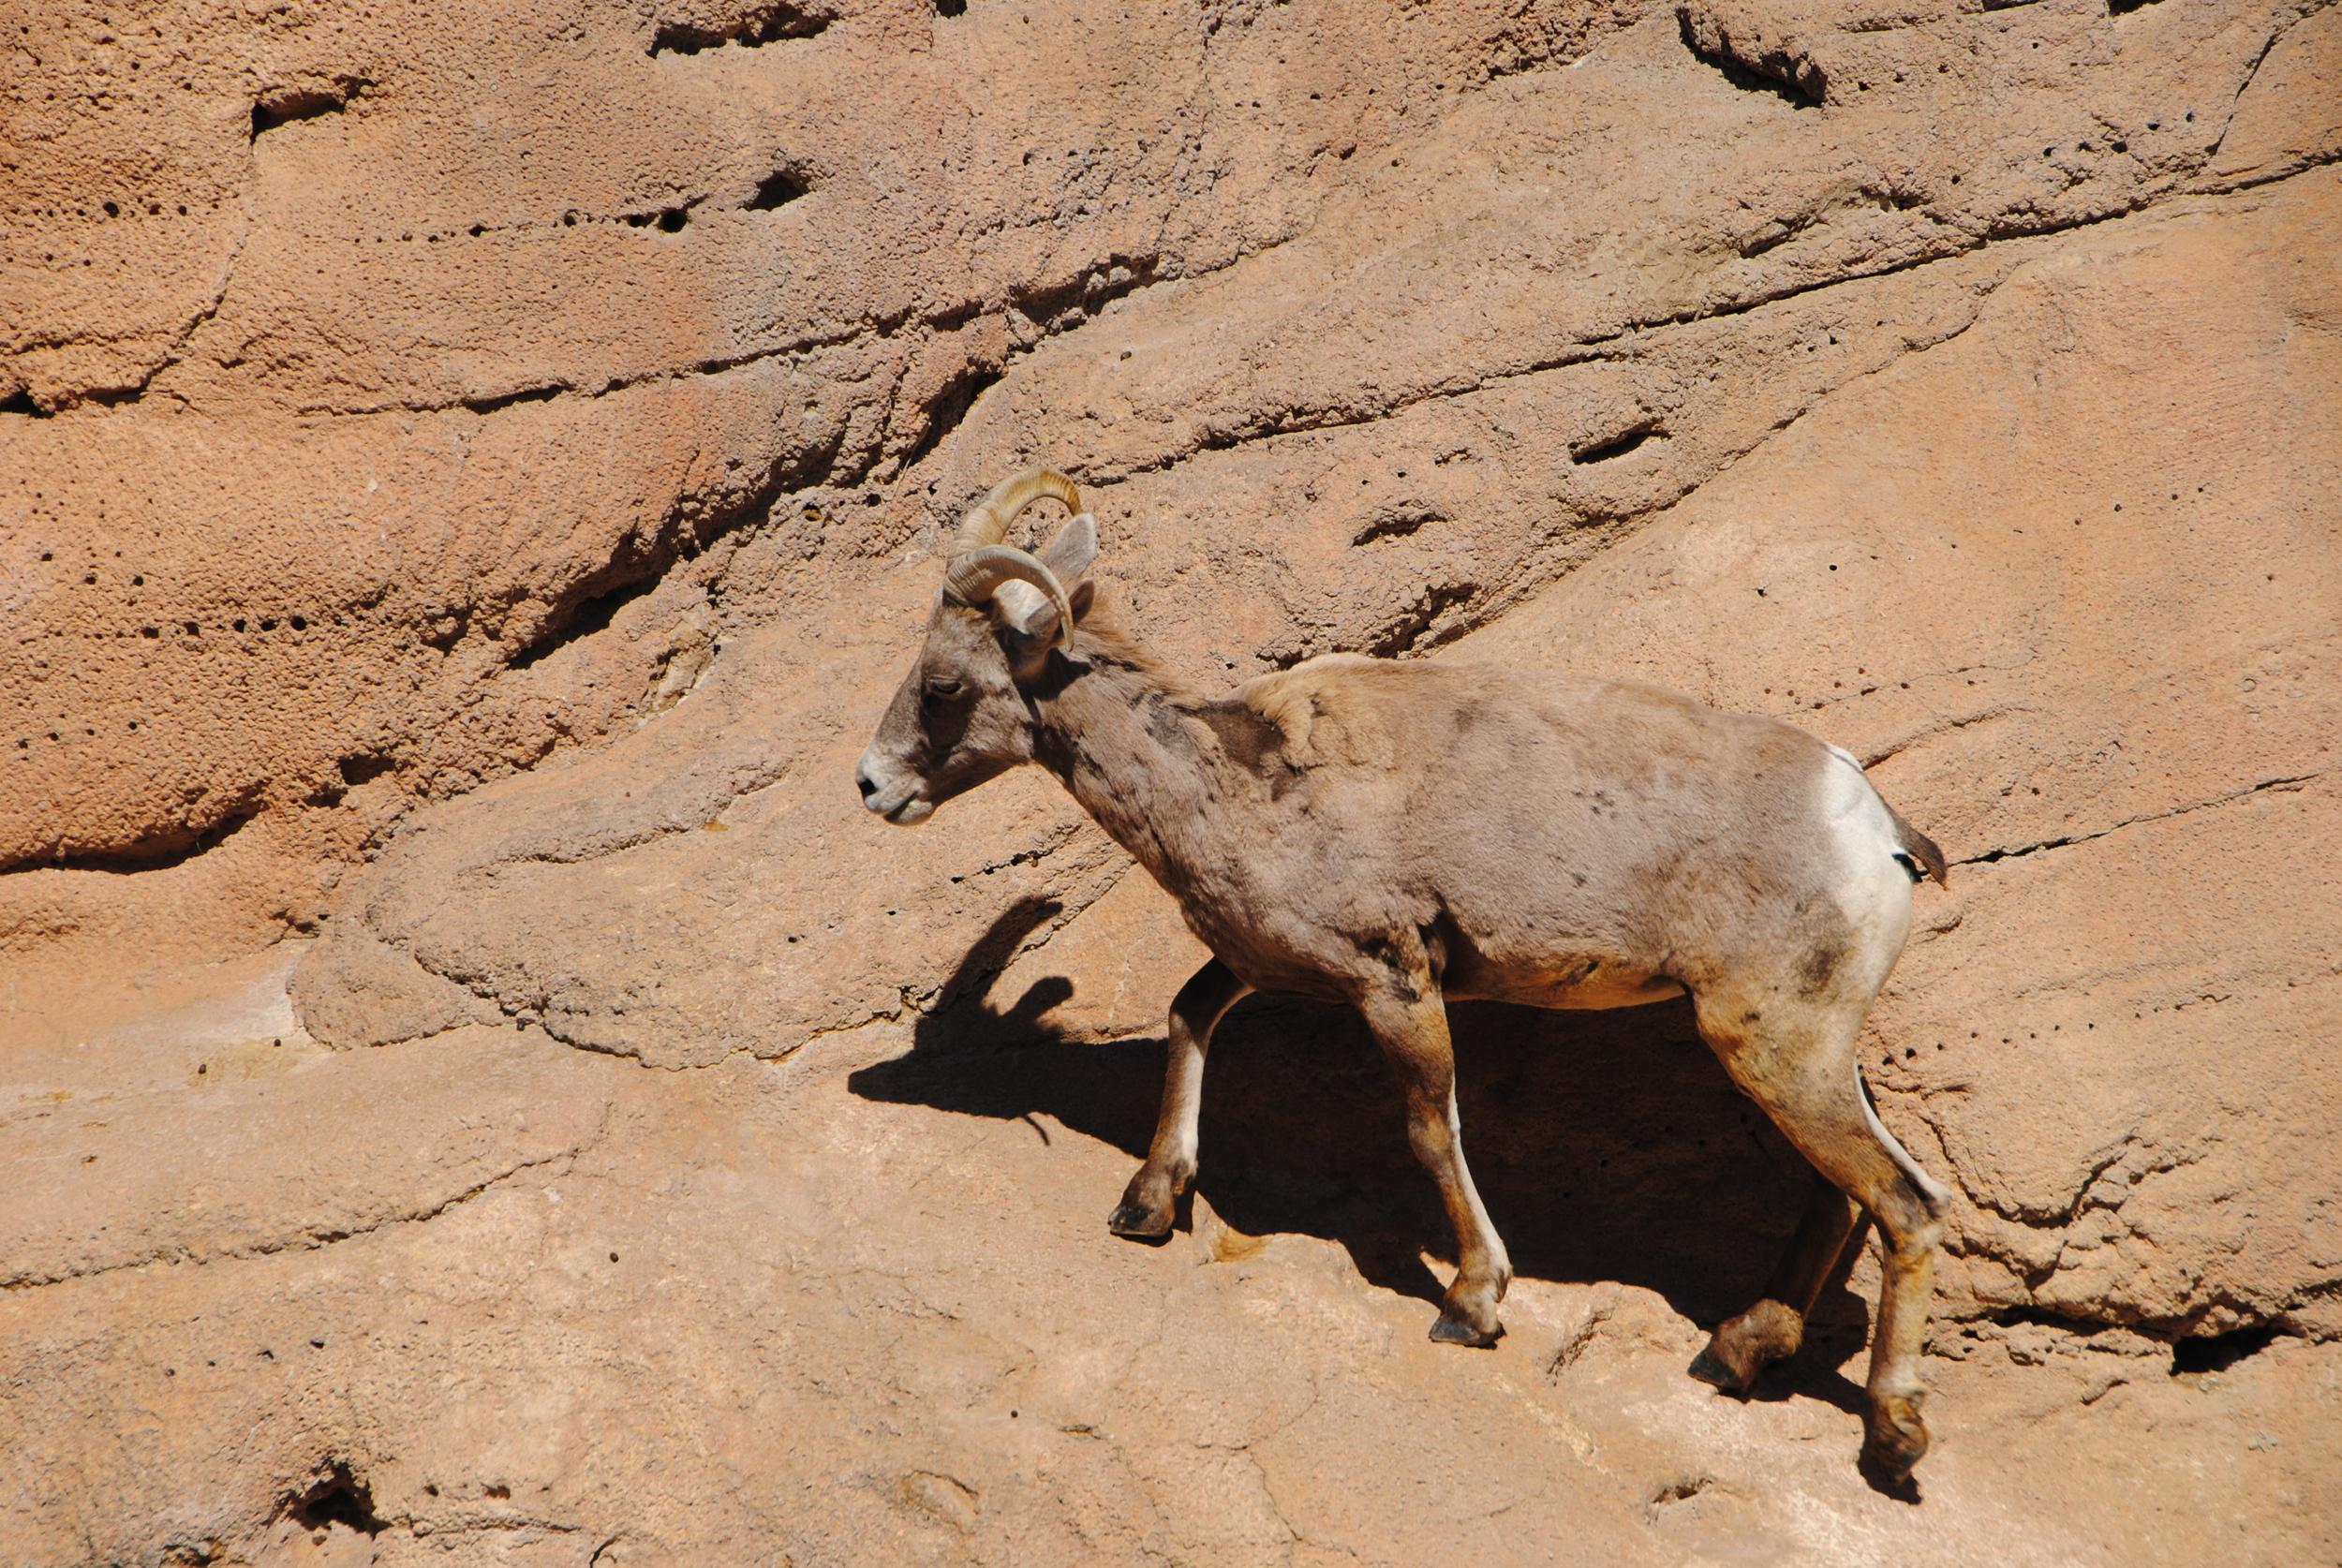 Female desert bighorn sheep.